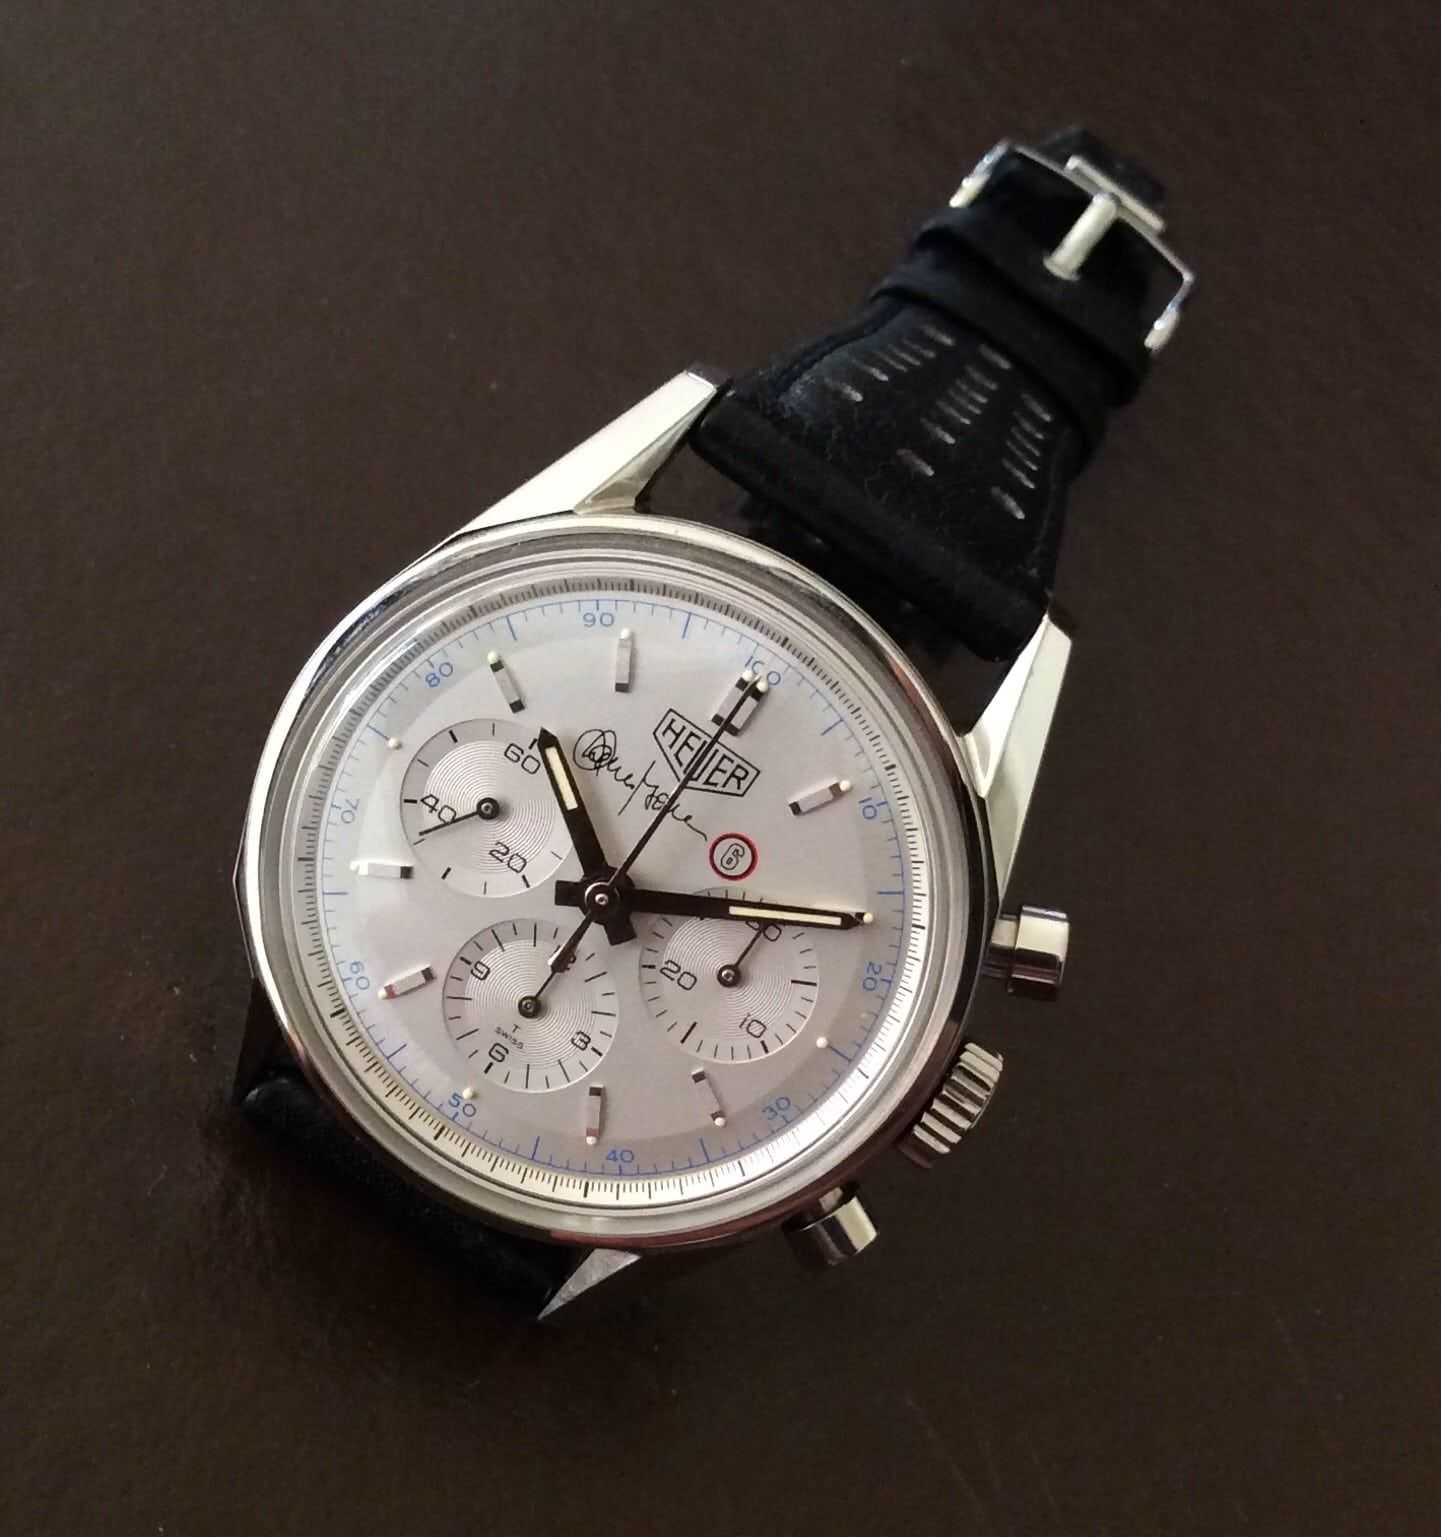 c58ba5f3c40cc Vintage Heuer Autavia GMT wHOROLOGy